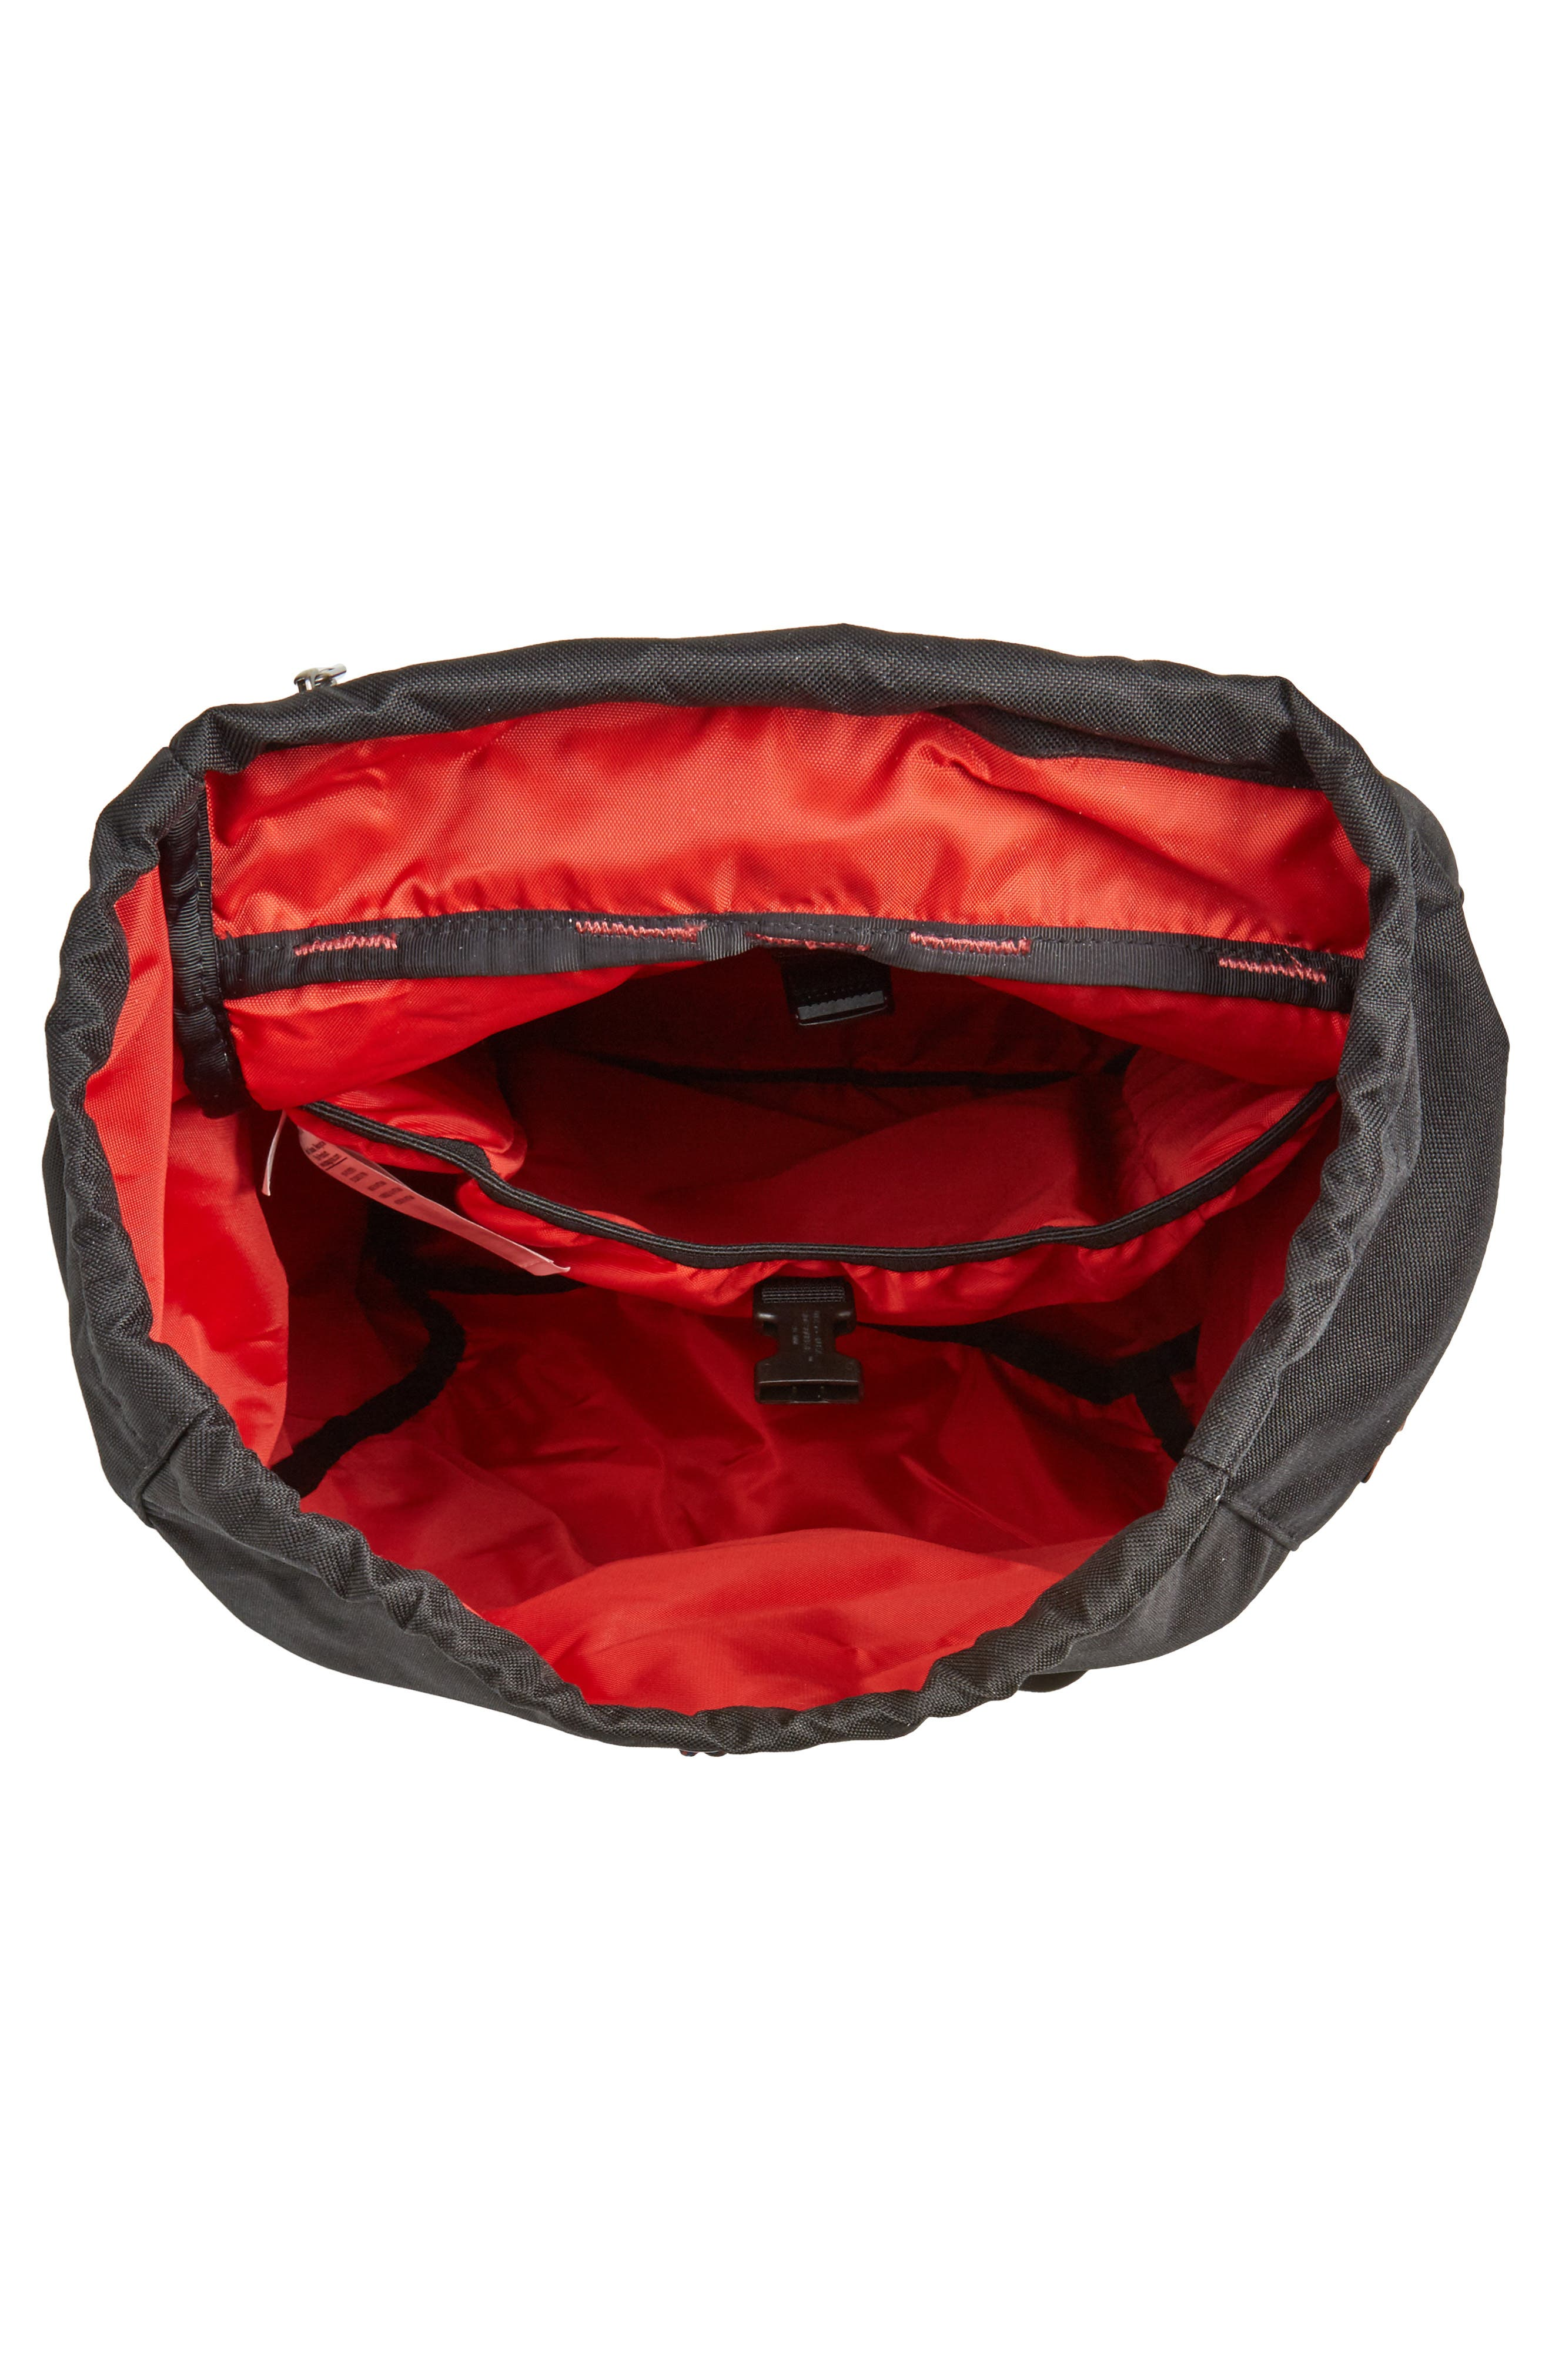 PATAGONIA, Arbor 26-Liter Backpack, Alternate thumbnail 4, color, 001